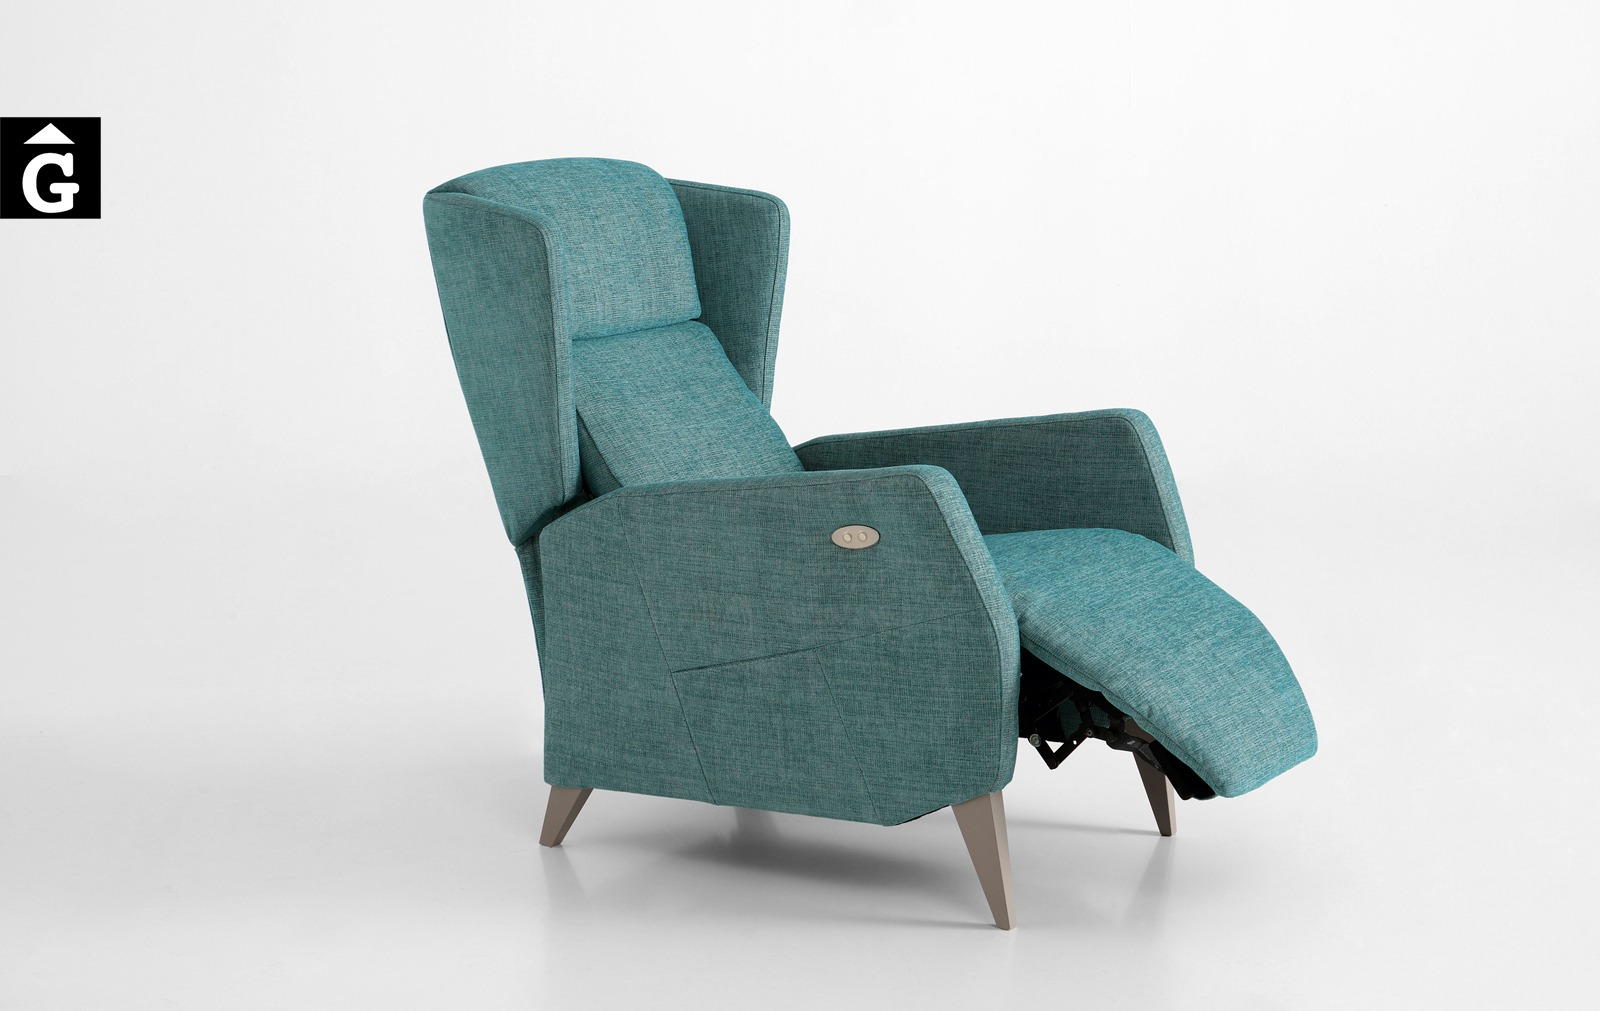 2 Tajoma by mobles Gifreu tapisseria de disseny actual i classic relax butaques sillons